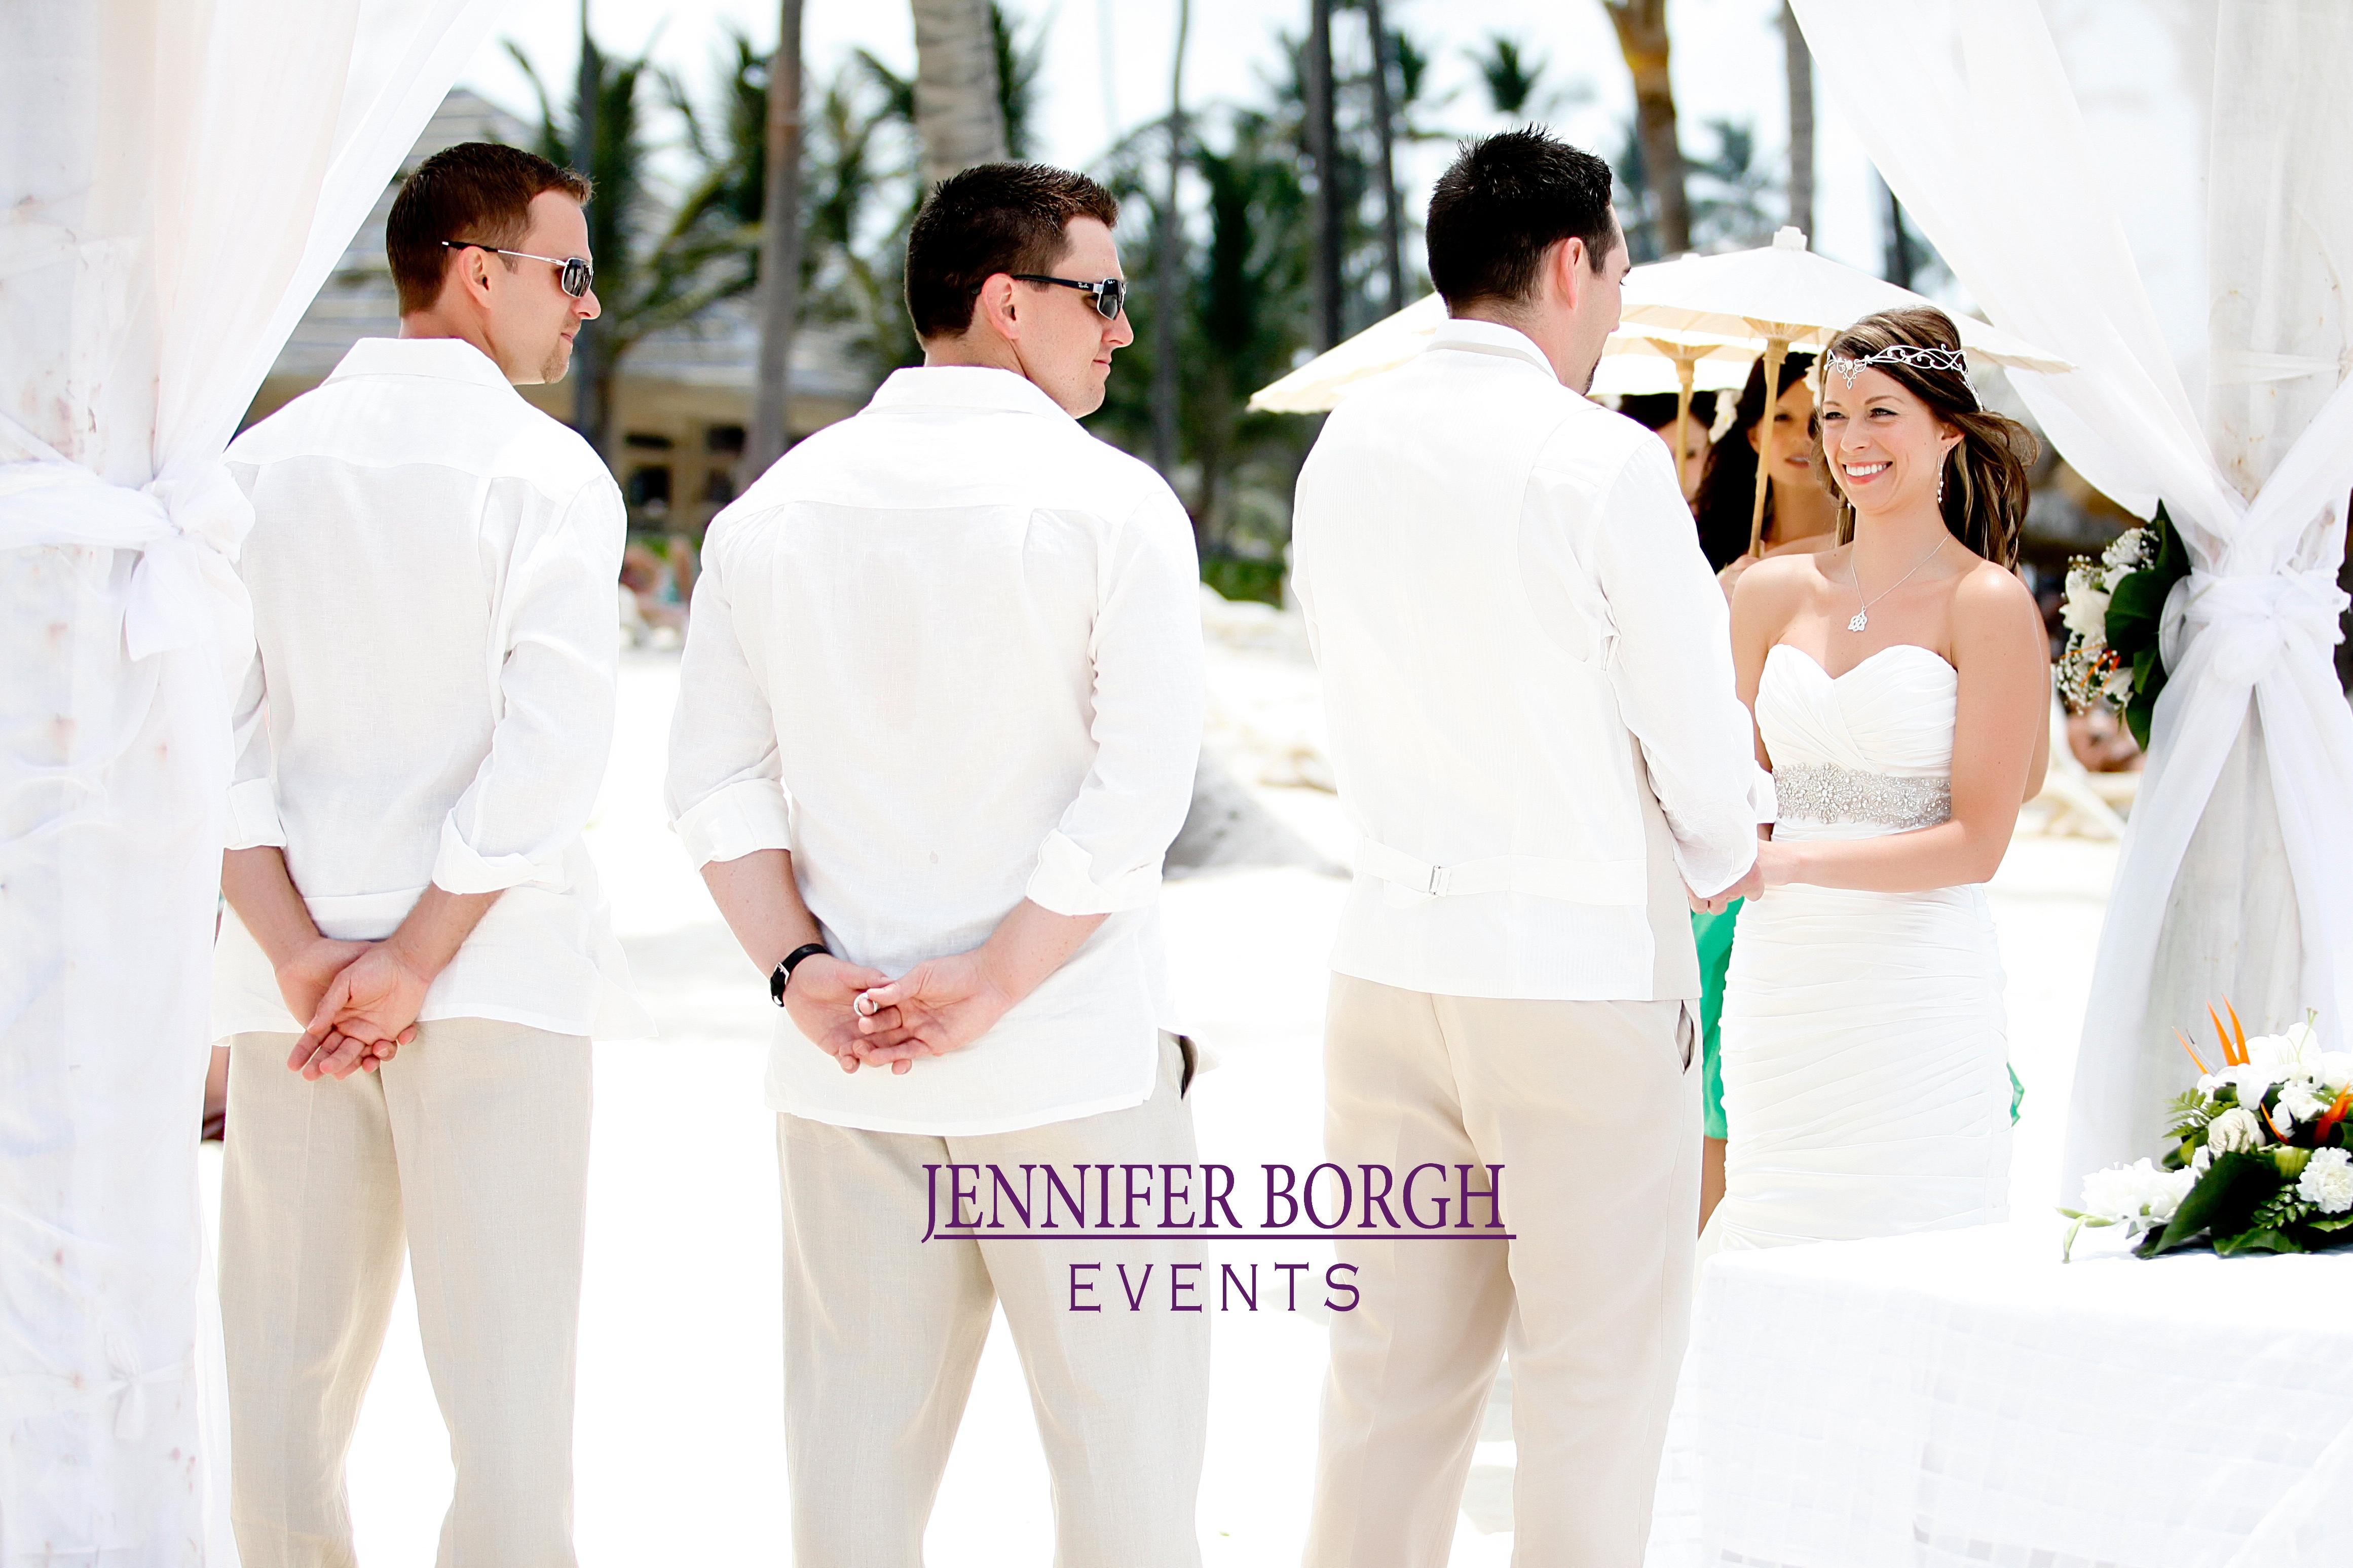 Lisa And Adams Destination Wedding In Punta Cana By Jennifer Borgh Events